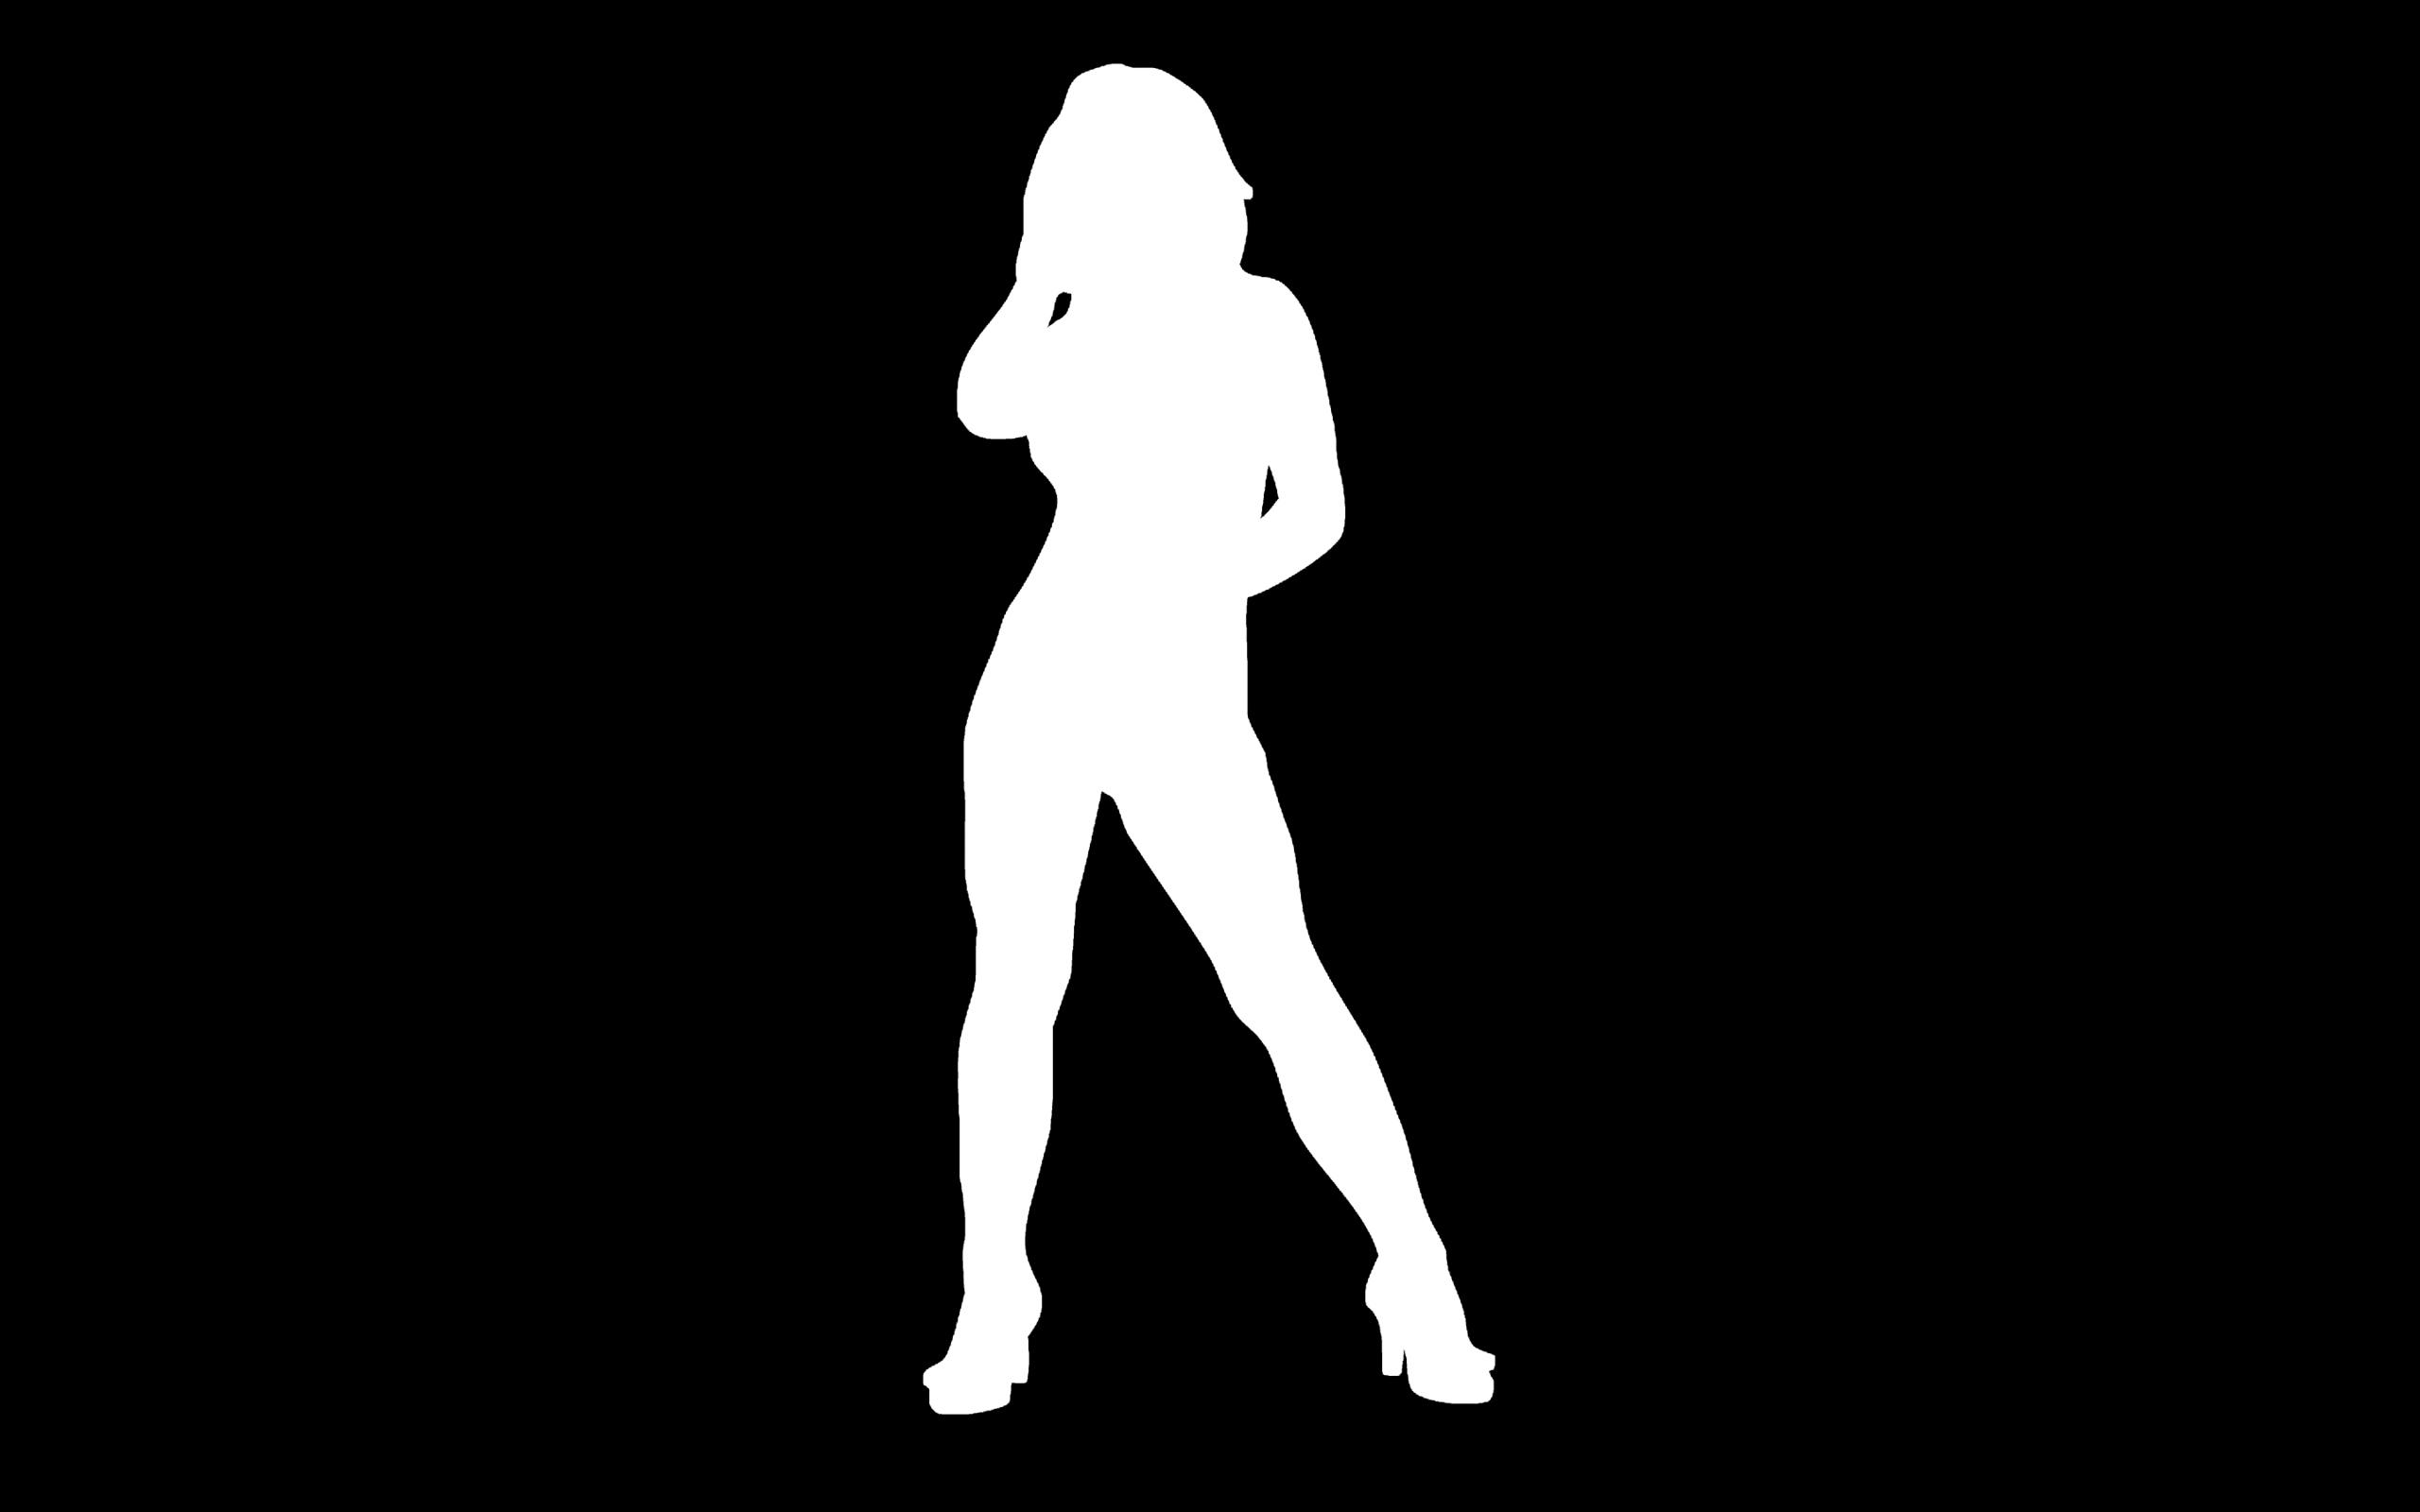 фото черно белое девушек силуэт